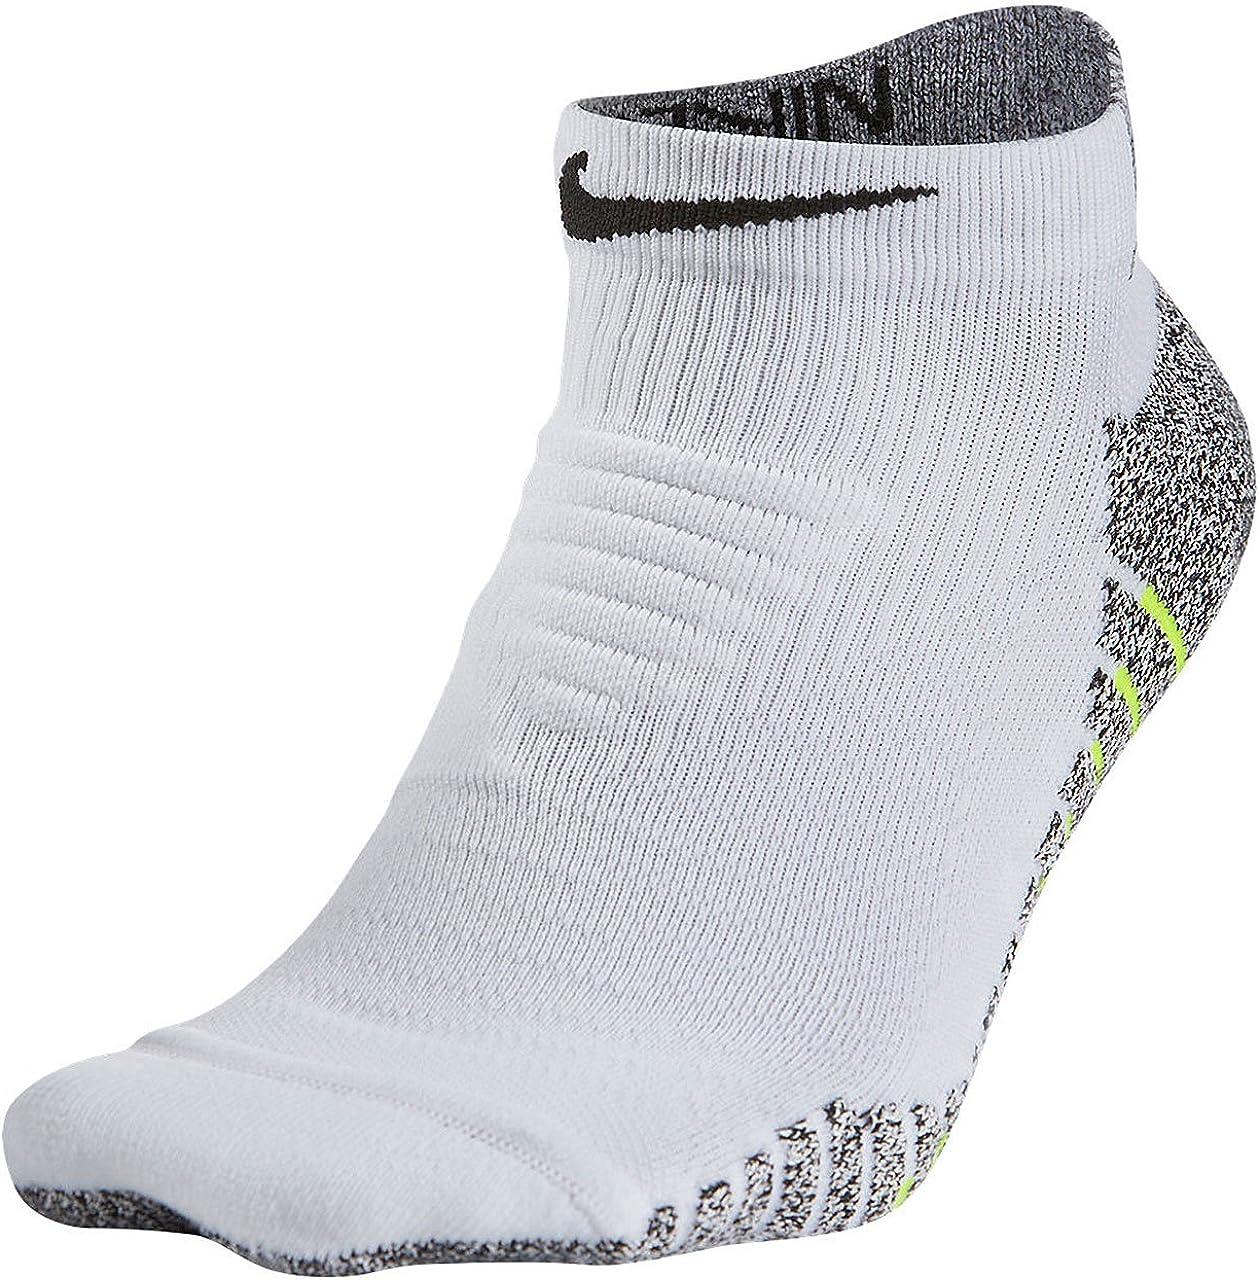 Nike Men's Grip Lightweight Low Training Socks Medium (Fits Men 6-8, Wmn 6-10) White,Black SX5751-100